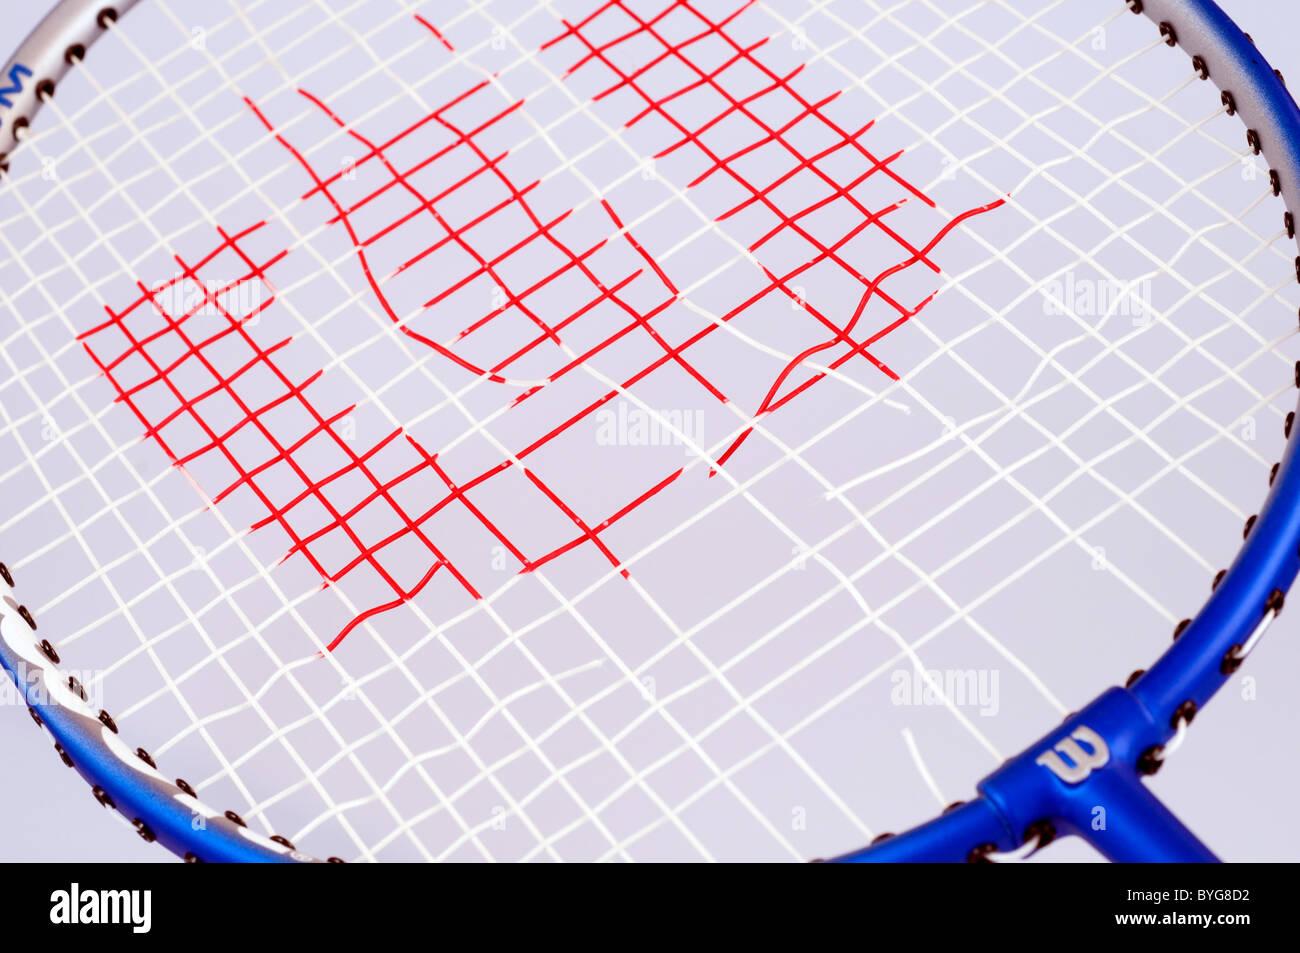 Broken Strings on a Badminton Racket - Stock Image